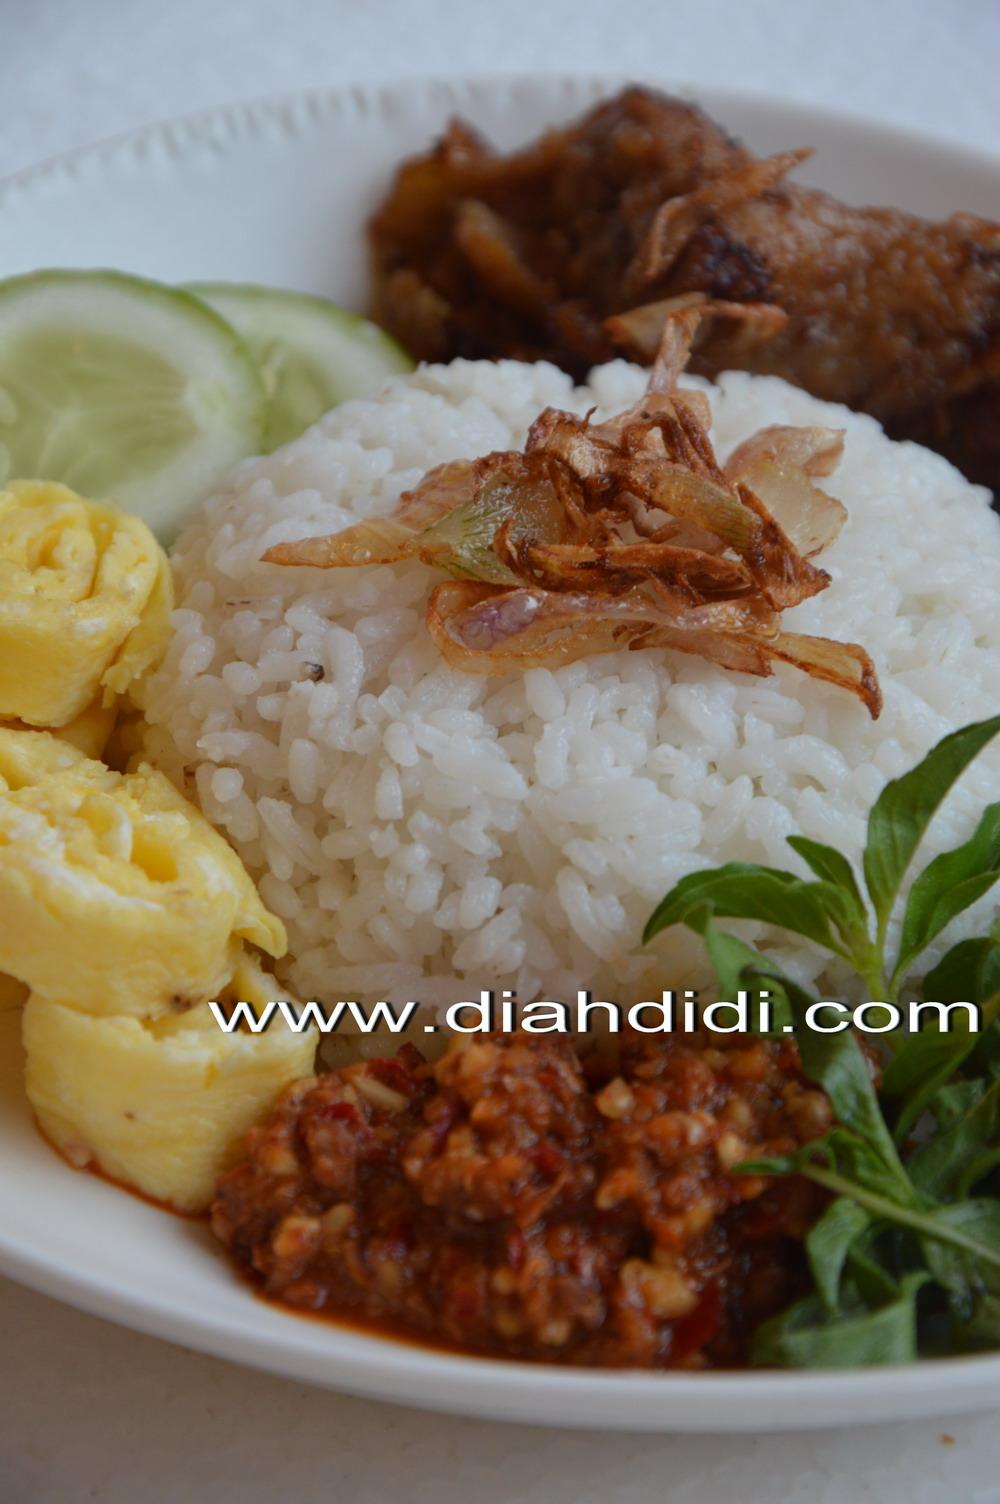 Diah Didi S Kitchen Bikin Nasi Uduk Sendiri Lebih Enak